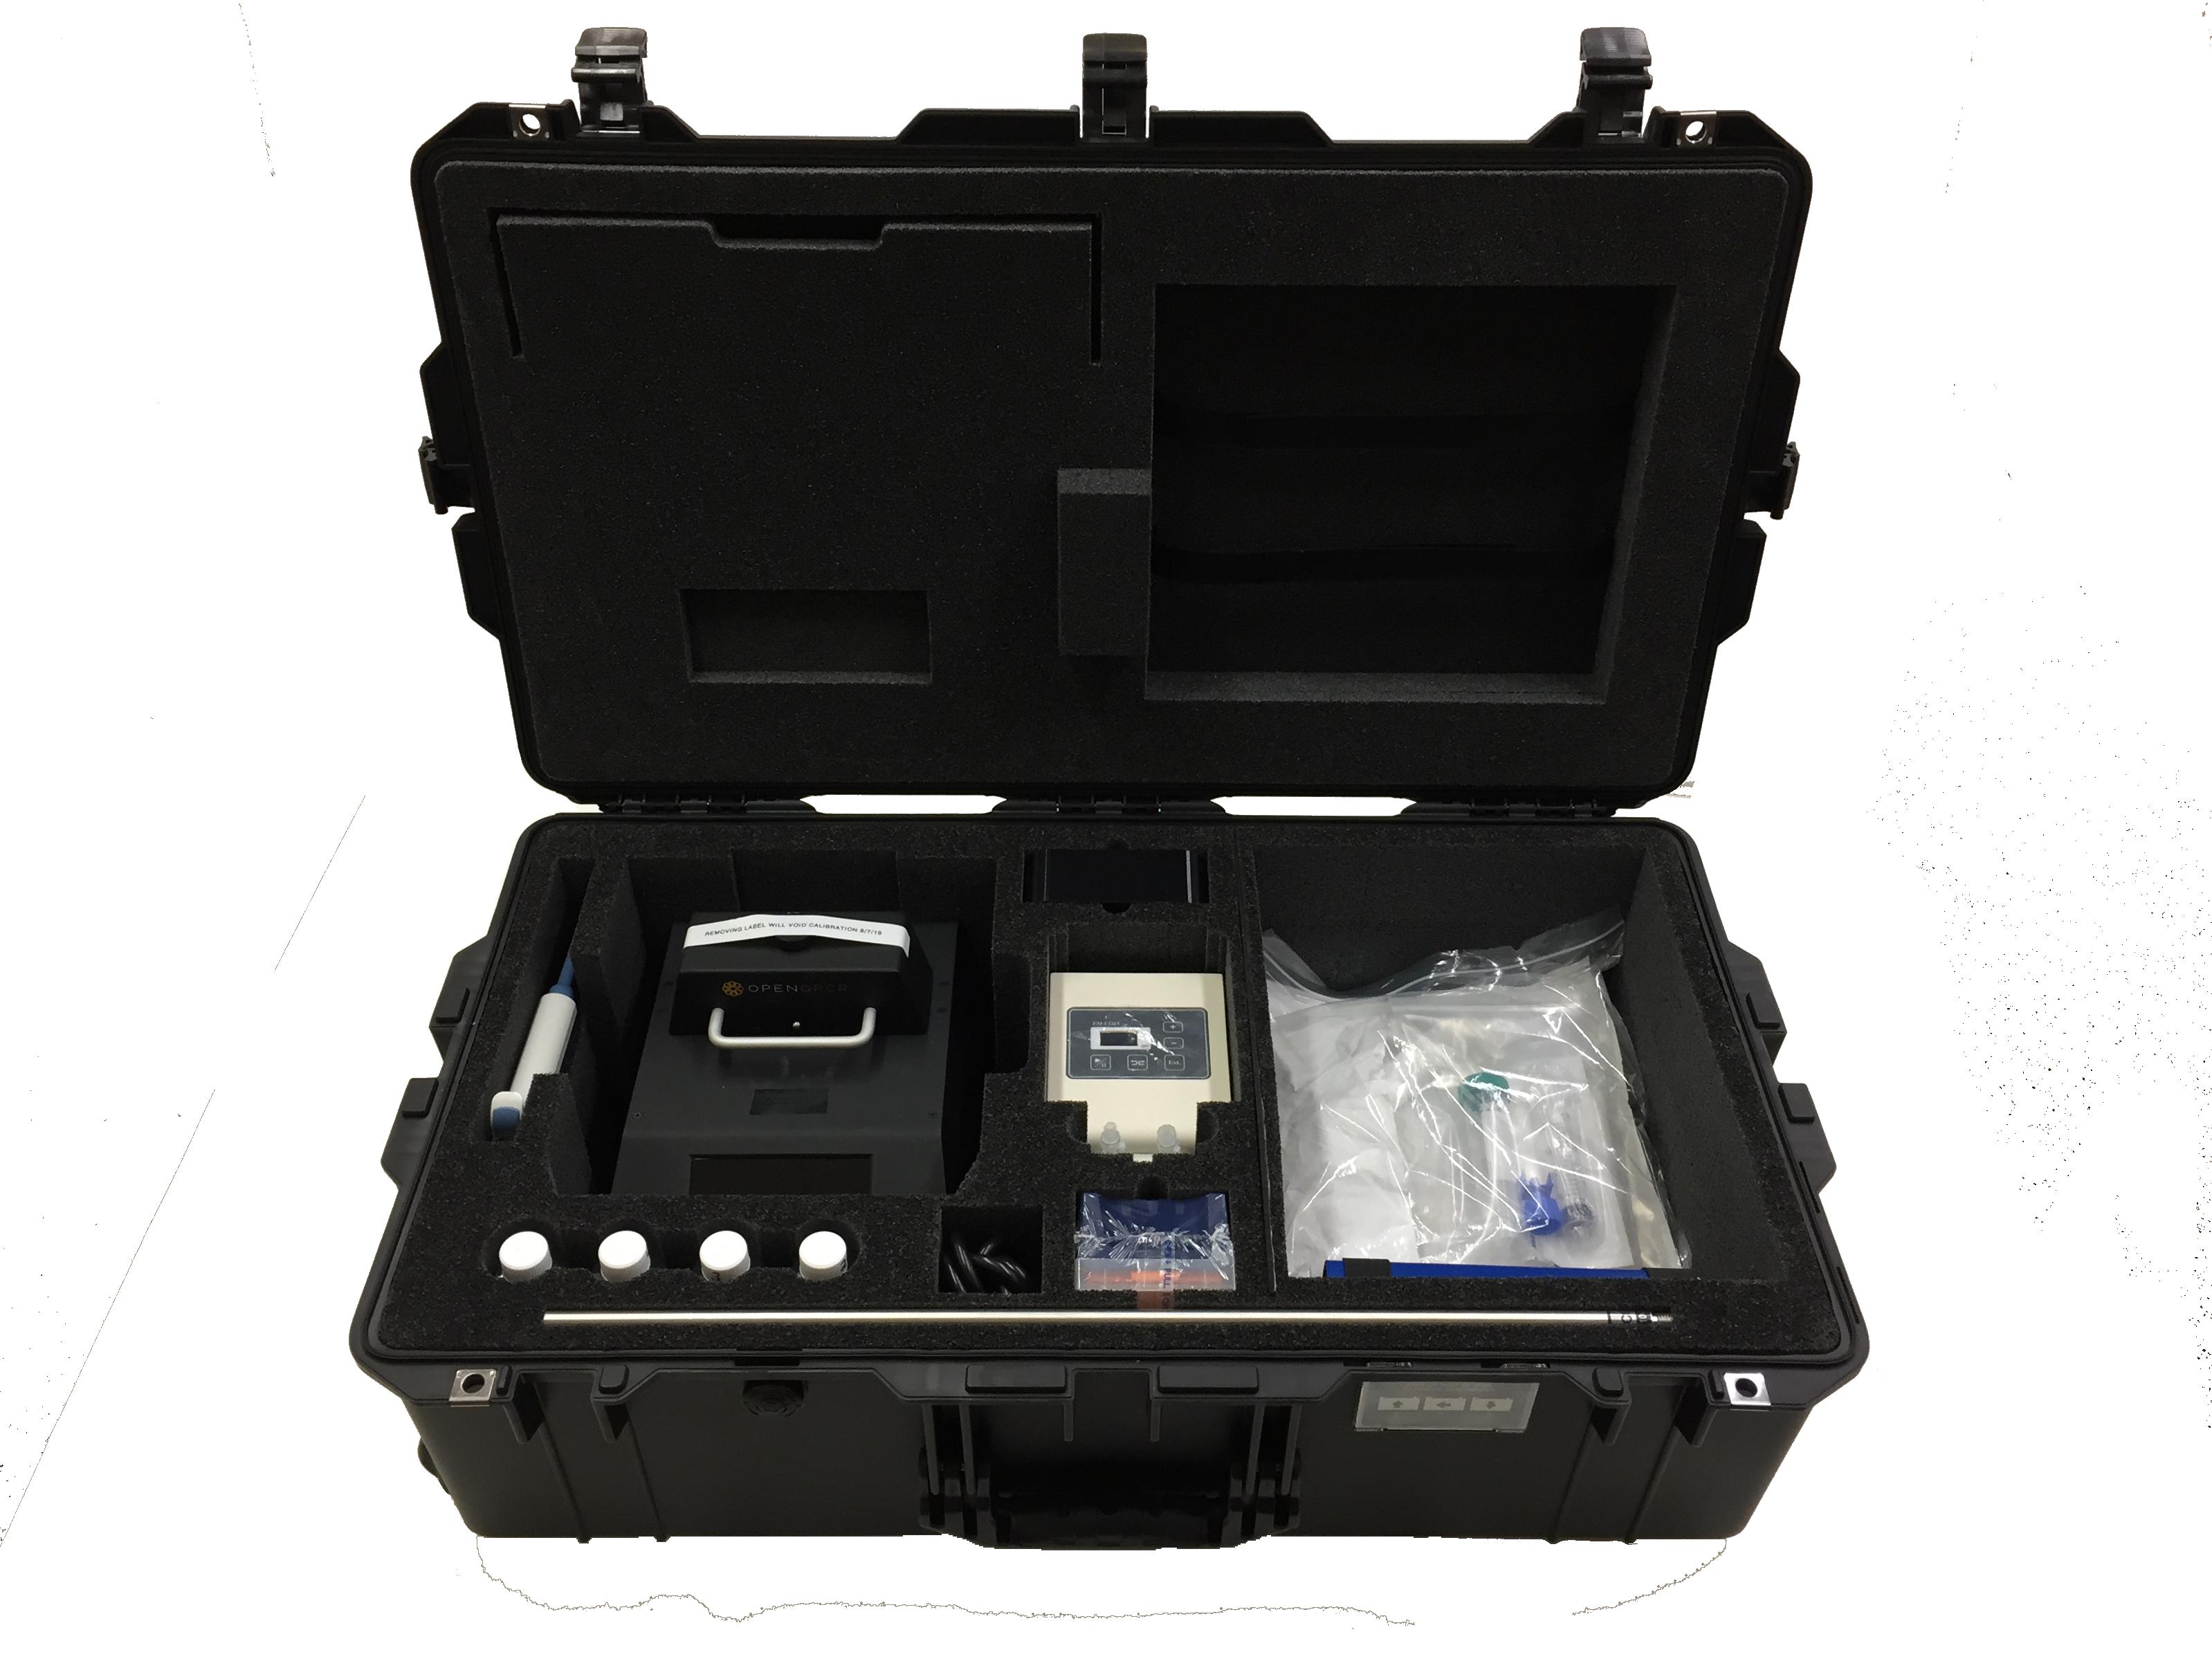 Customized Travel Case for Equipment – FUSH Cases